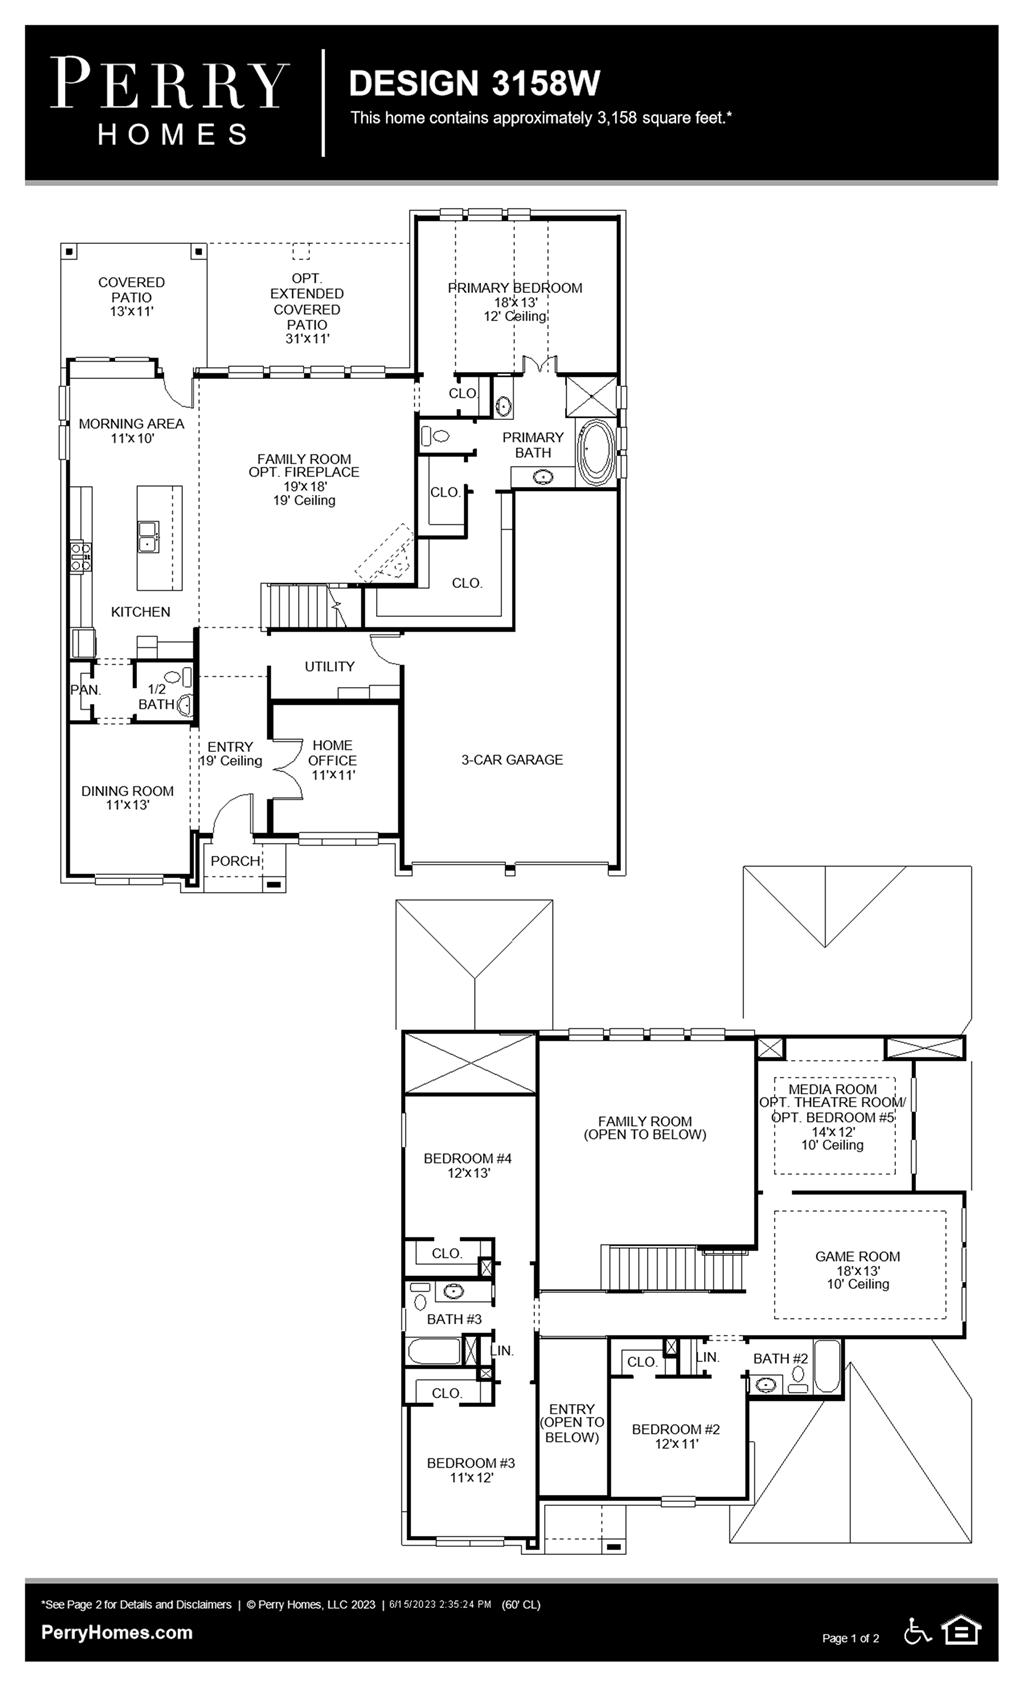 Floor Plan for 3158W